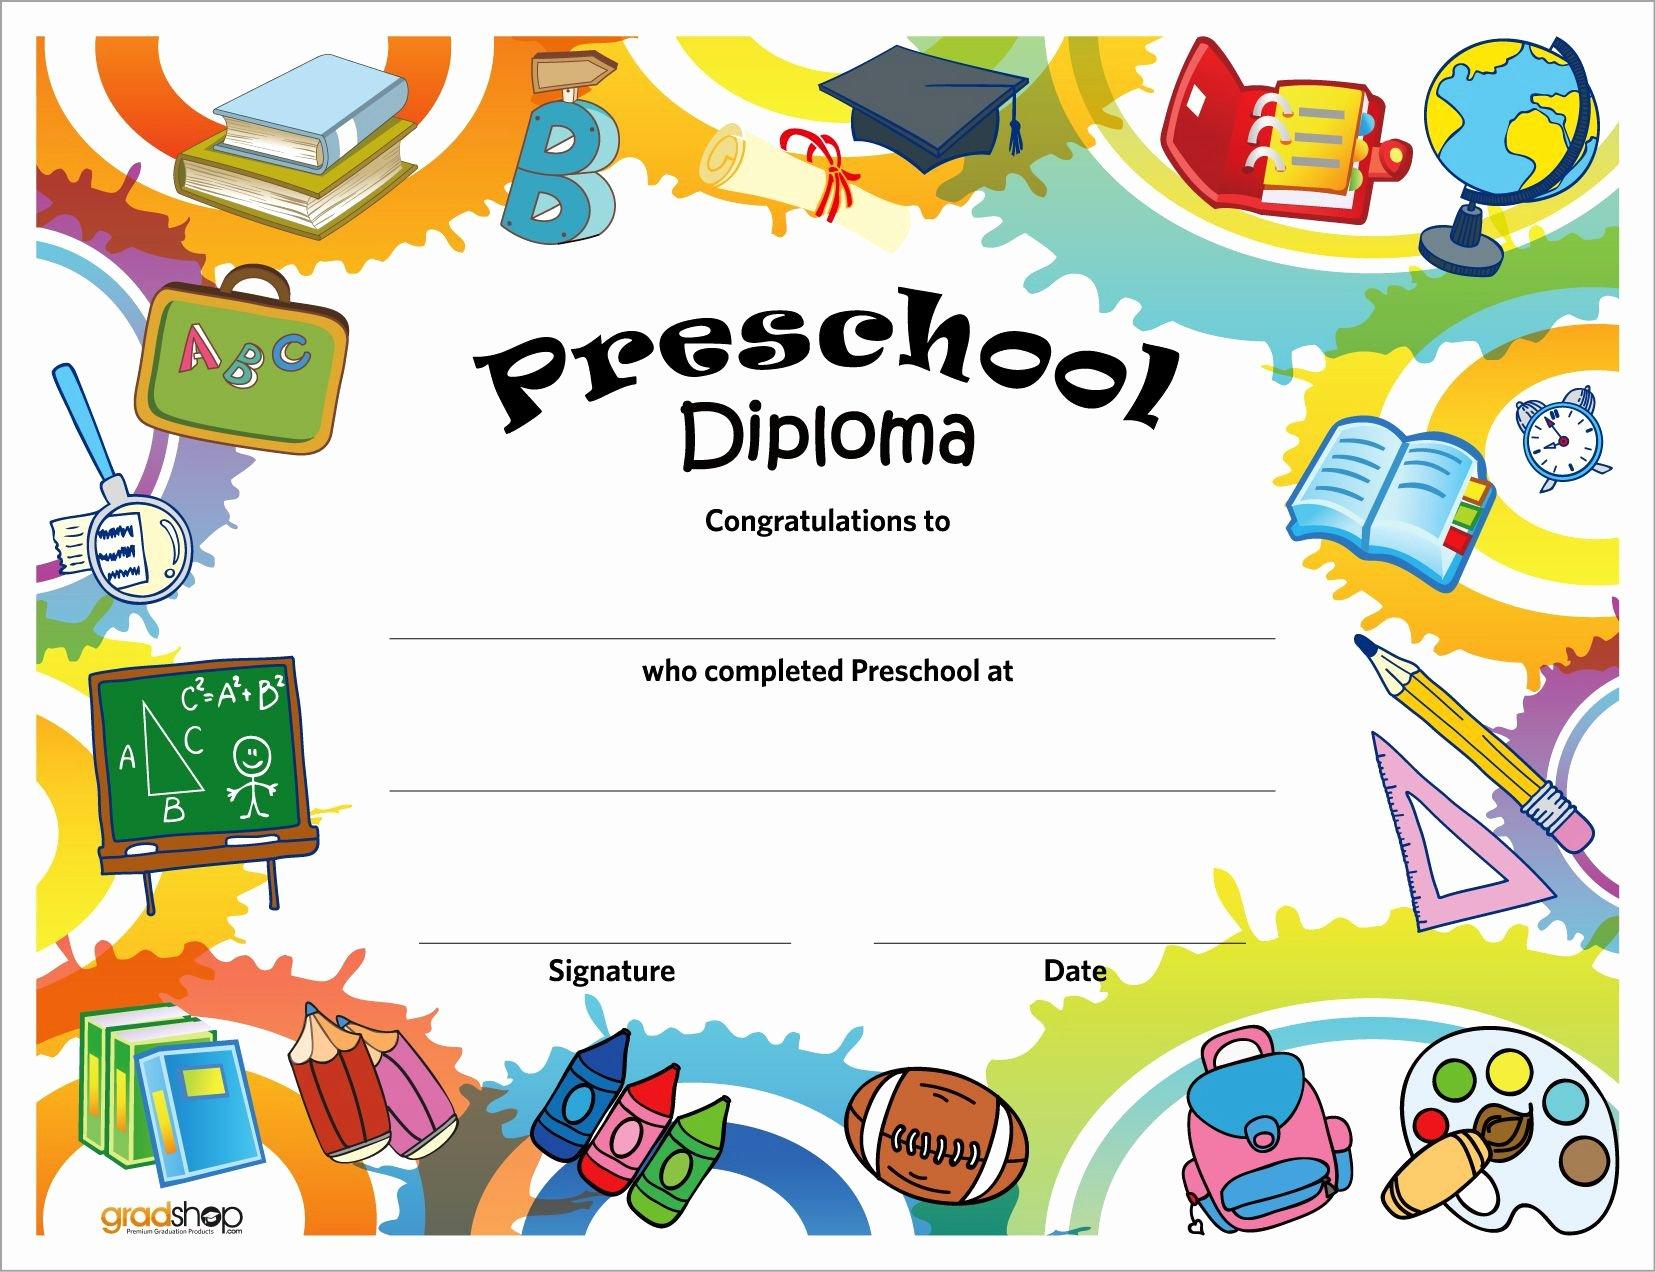 Kindergarten Certificates Free Printable Inspirational Free Printable Preschool Diplomas